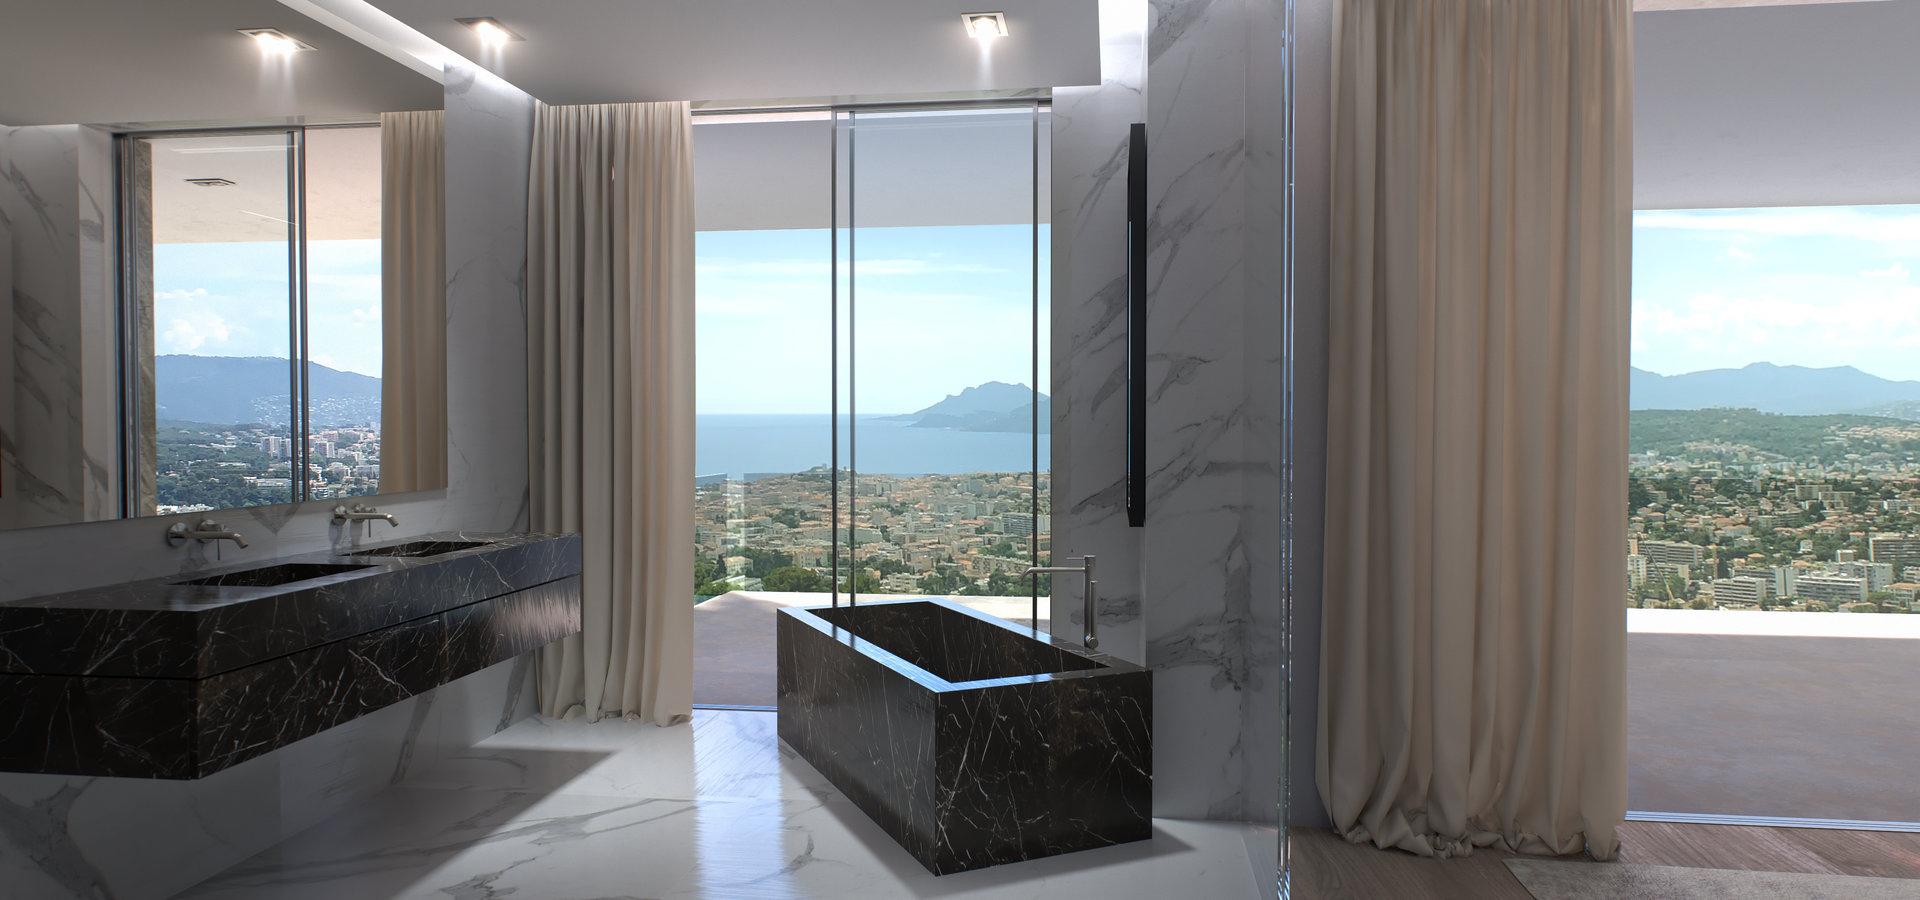 luxury black marble bathroom with freestanding bathtub and sinks